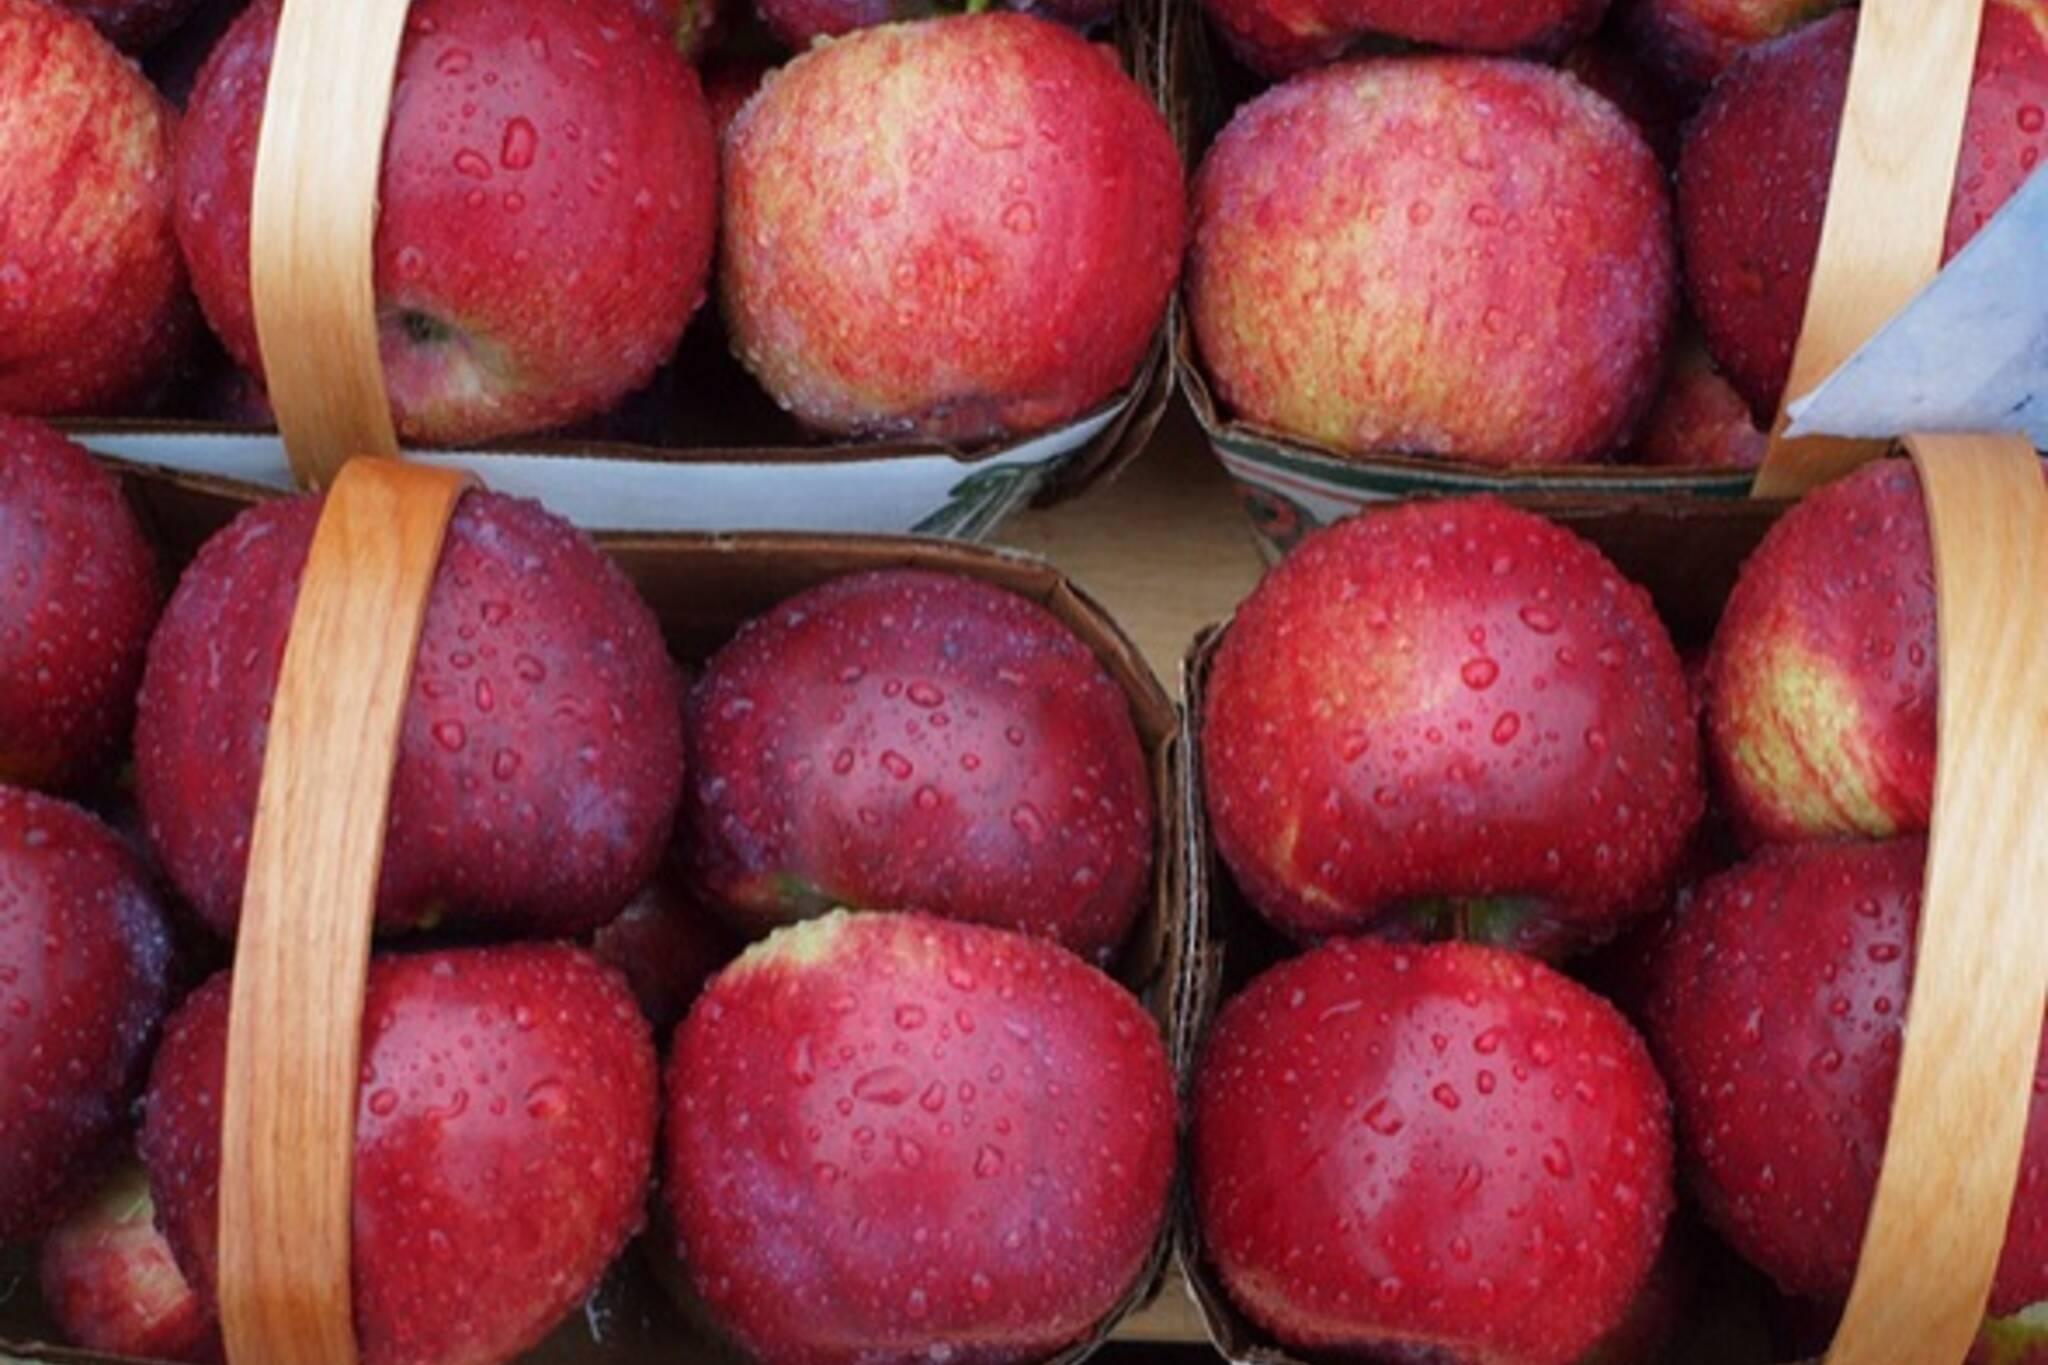 Apples Toronto autumn